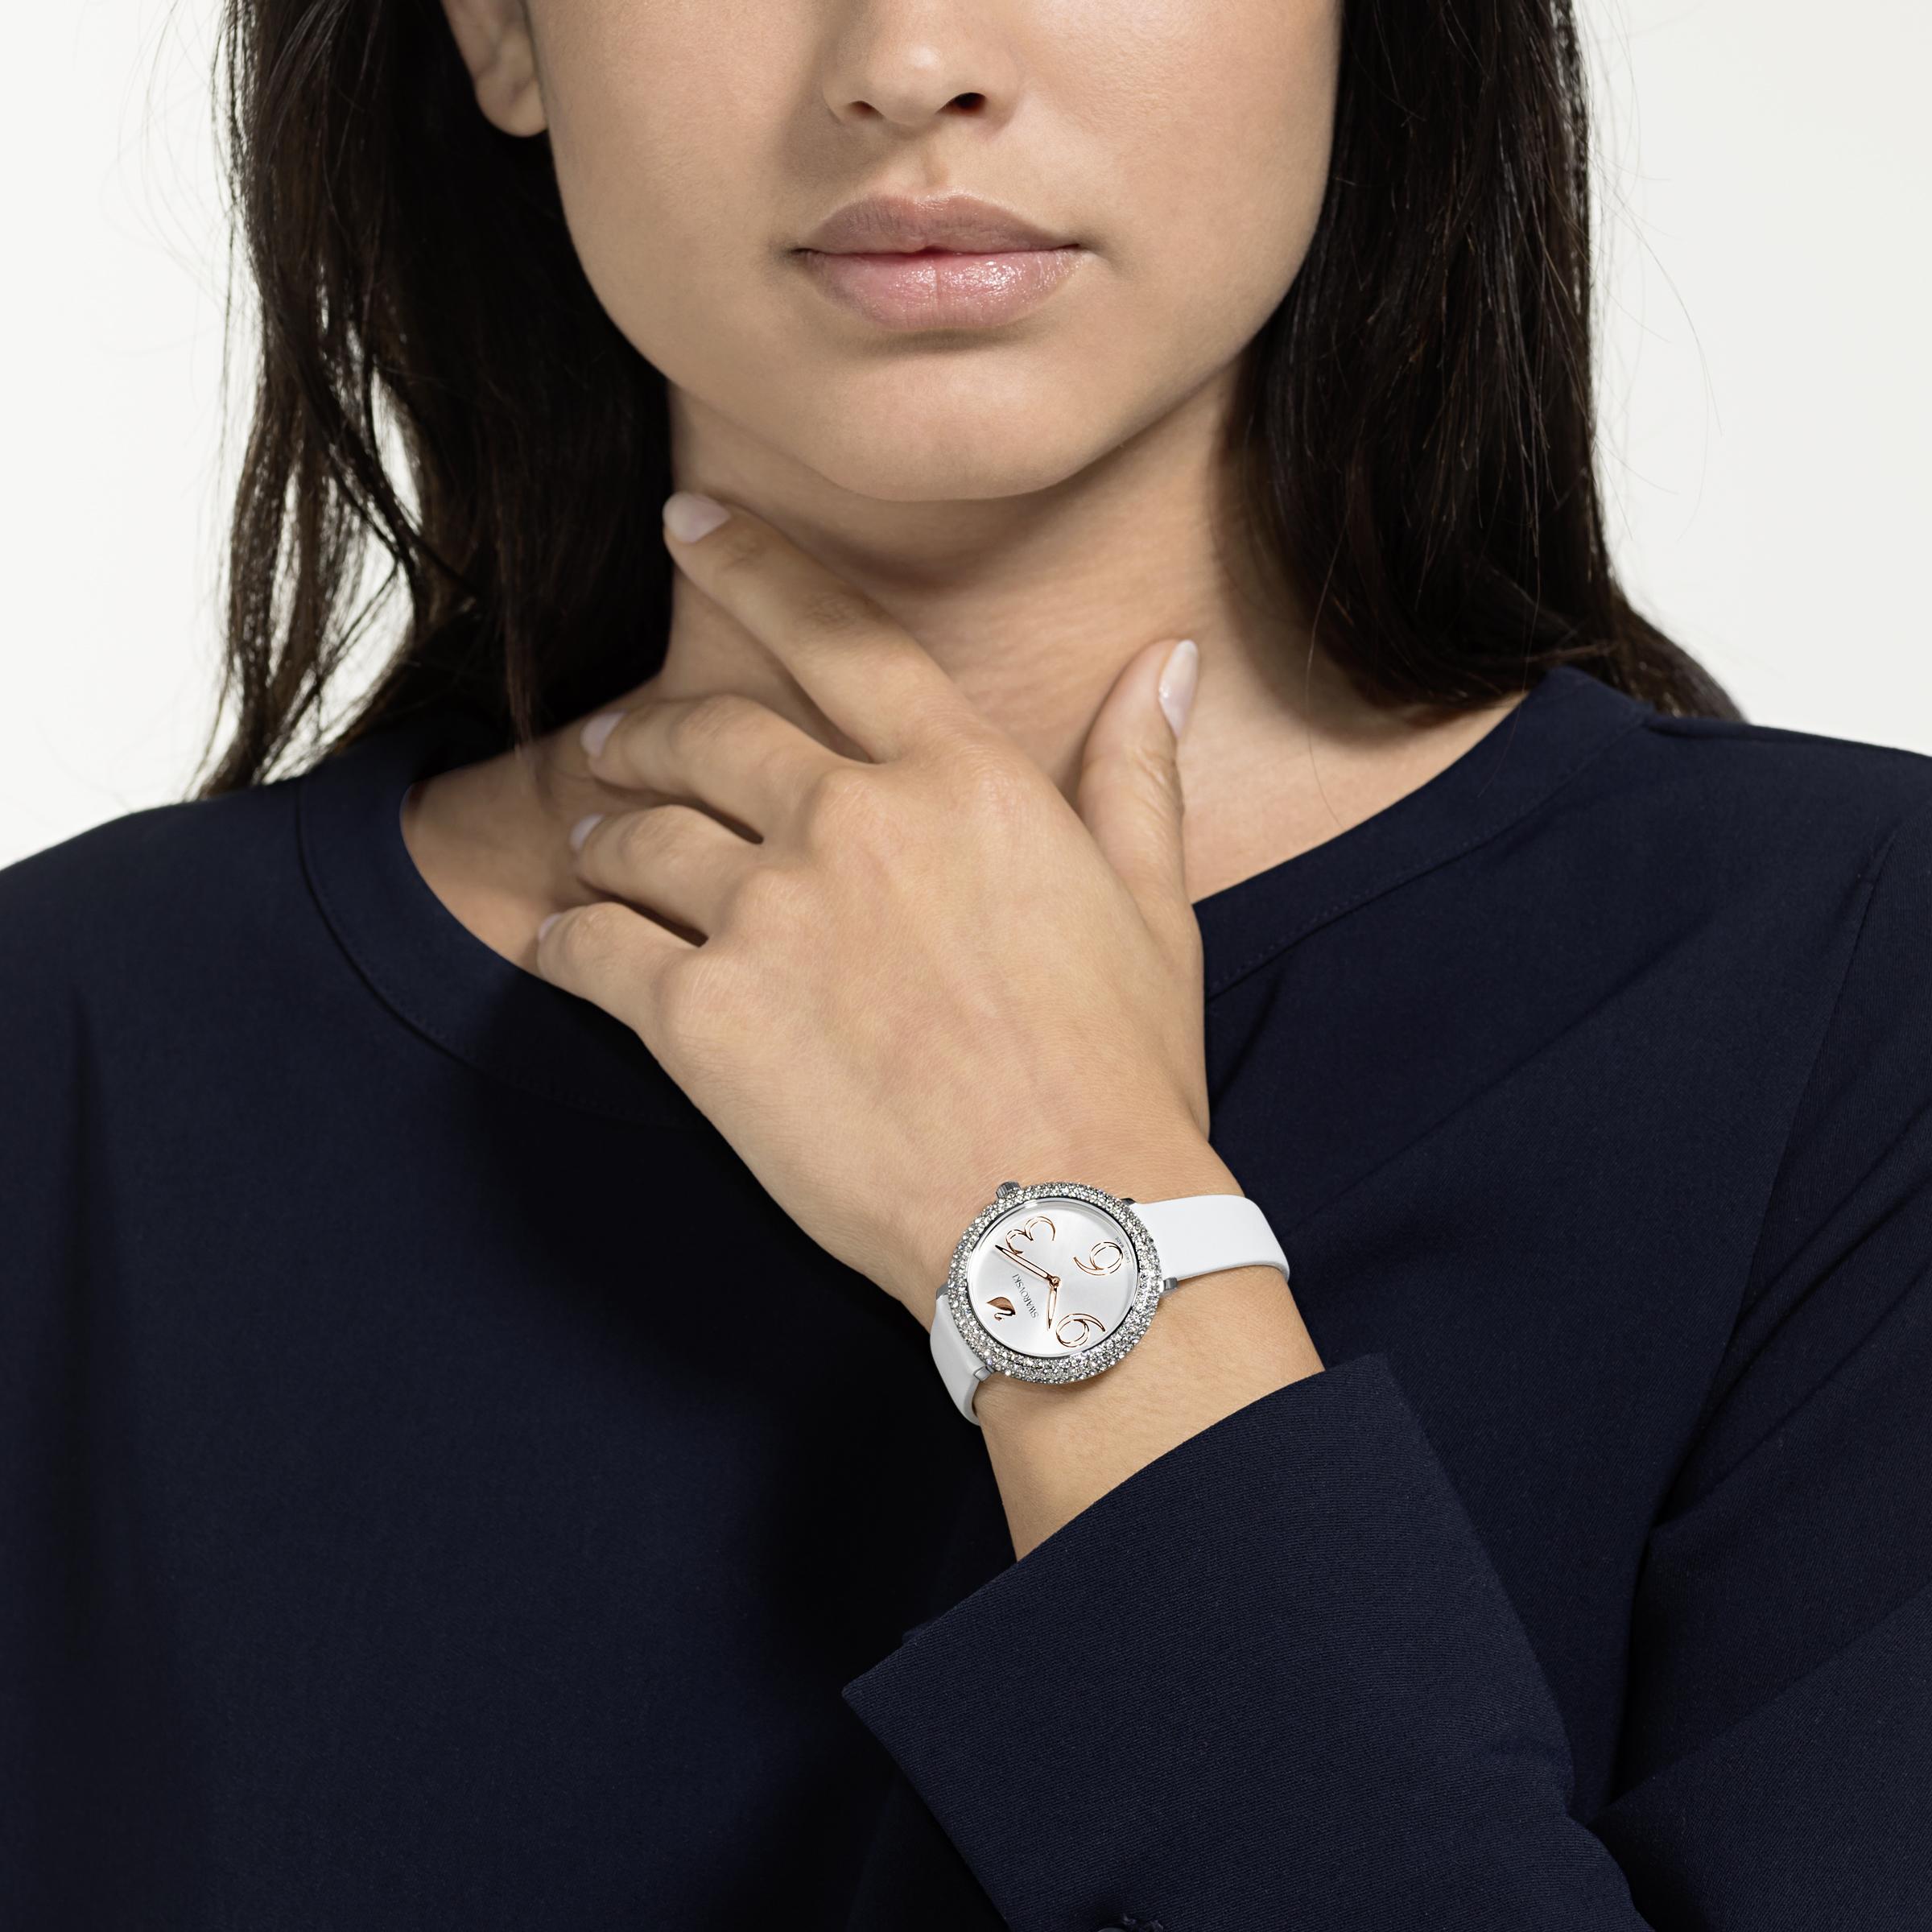 Montre Crystal Frost, Bracelet en cuir, blanc, acier inoxydable Swarovski